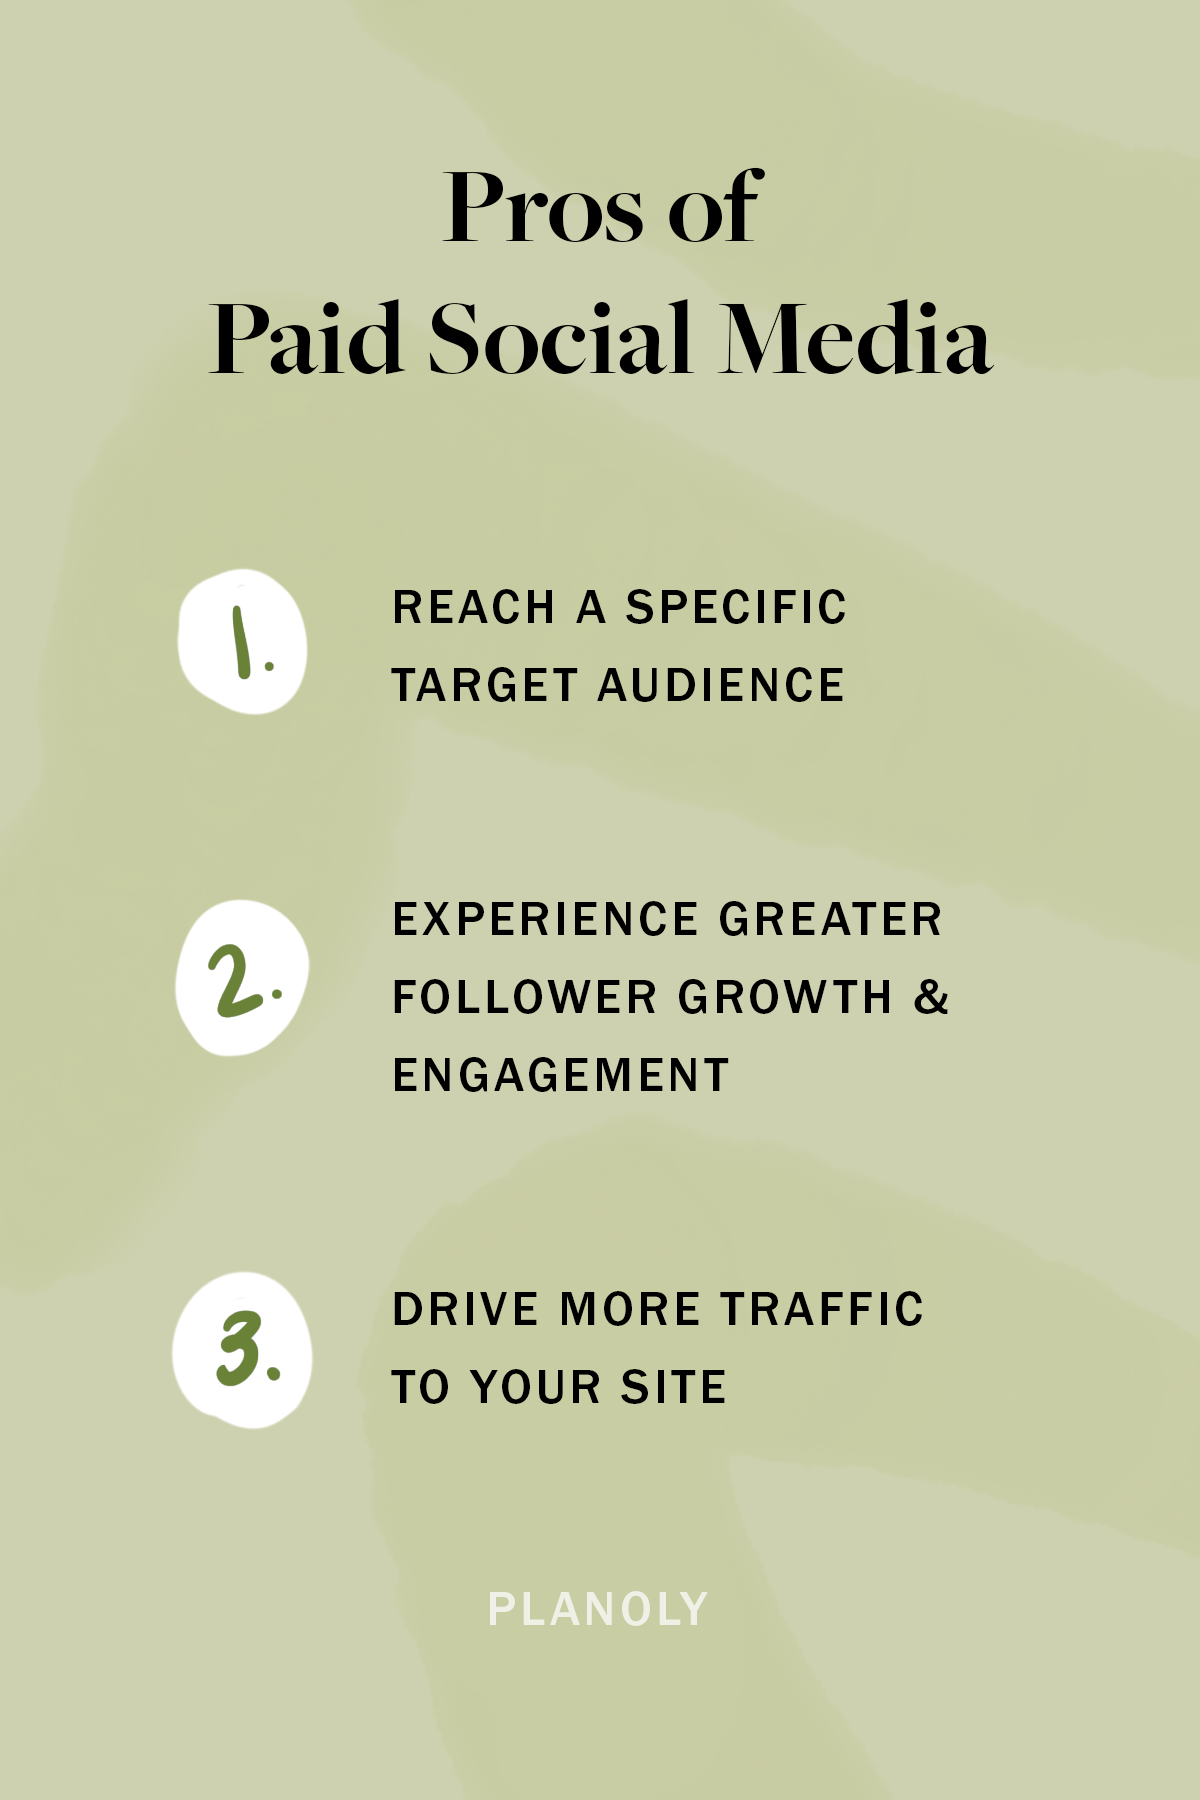 PLANOLY-Blog Post-Organic vs Paid Social-Image 3